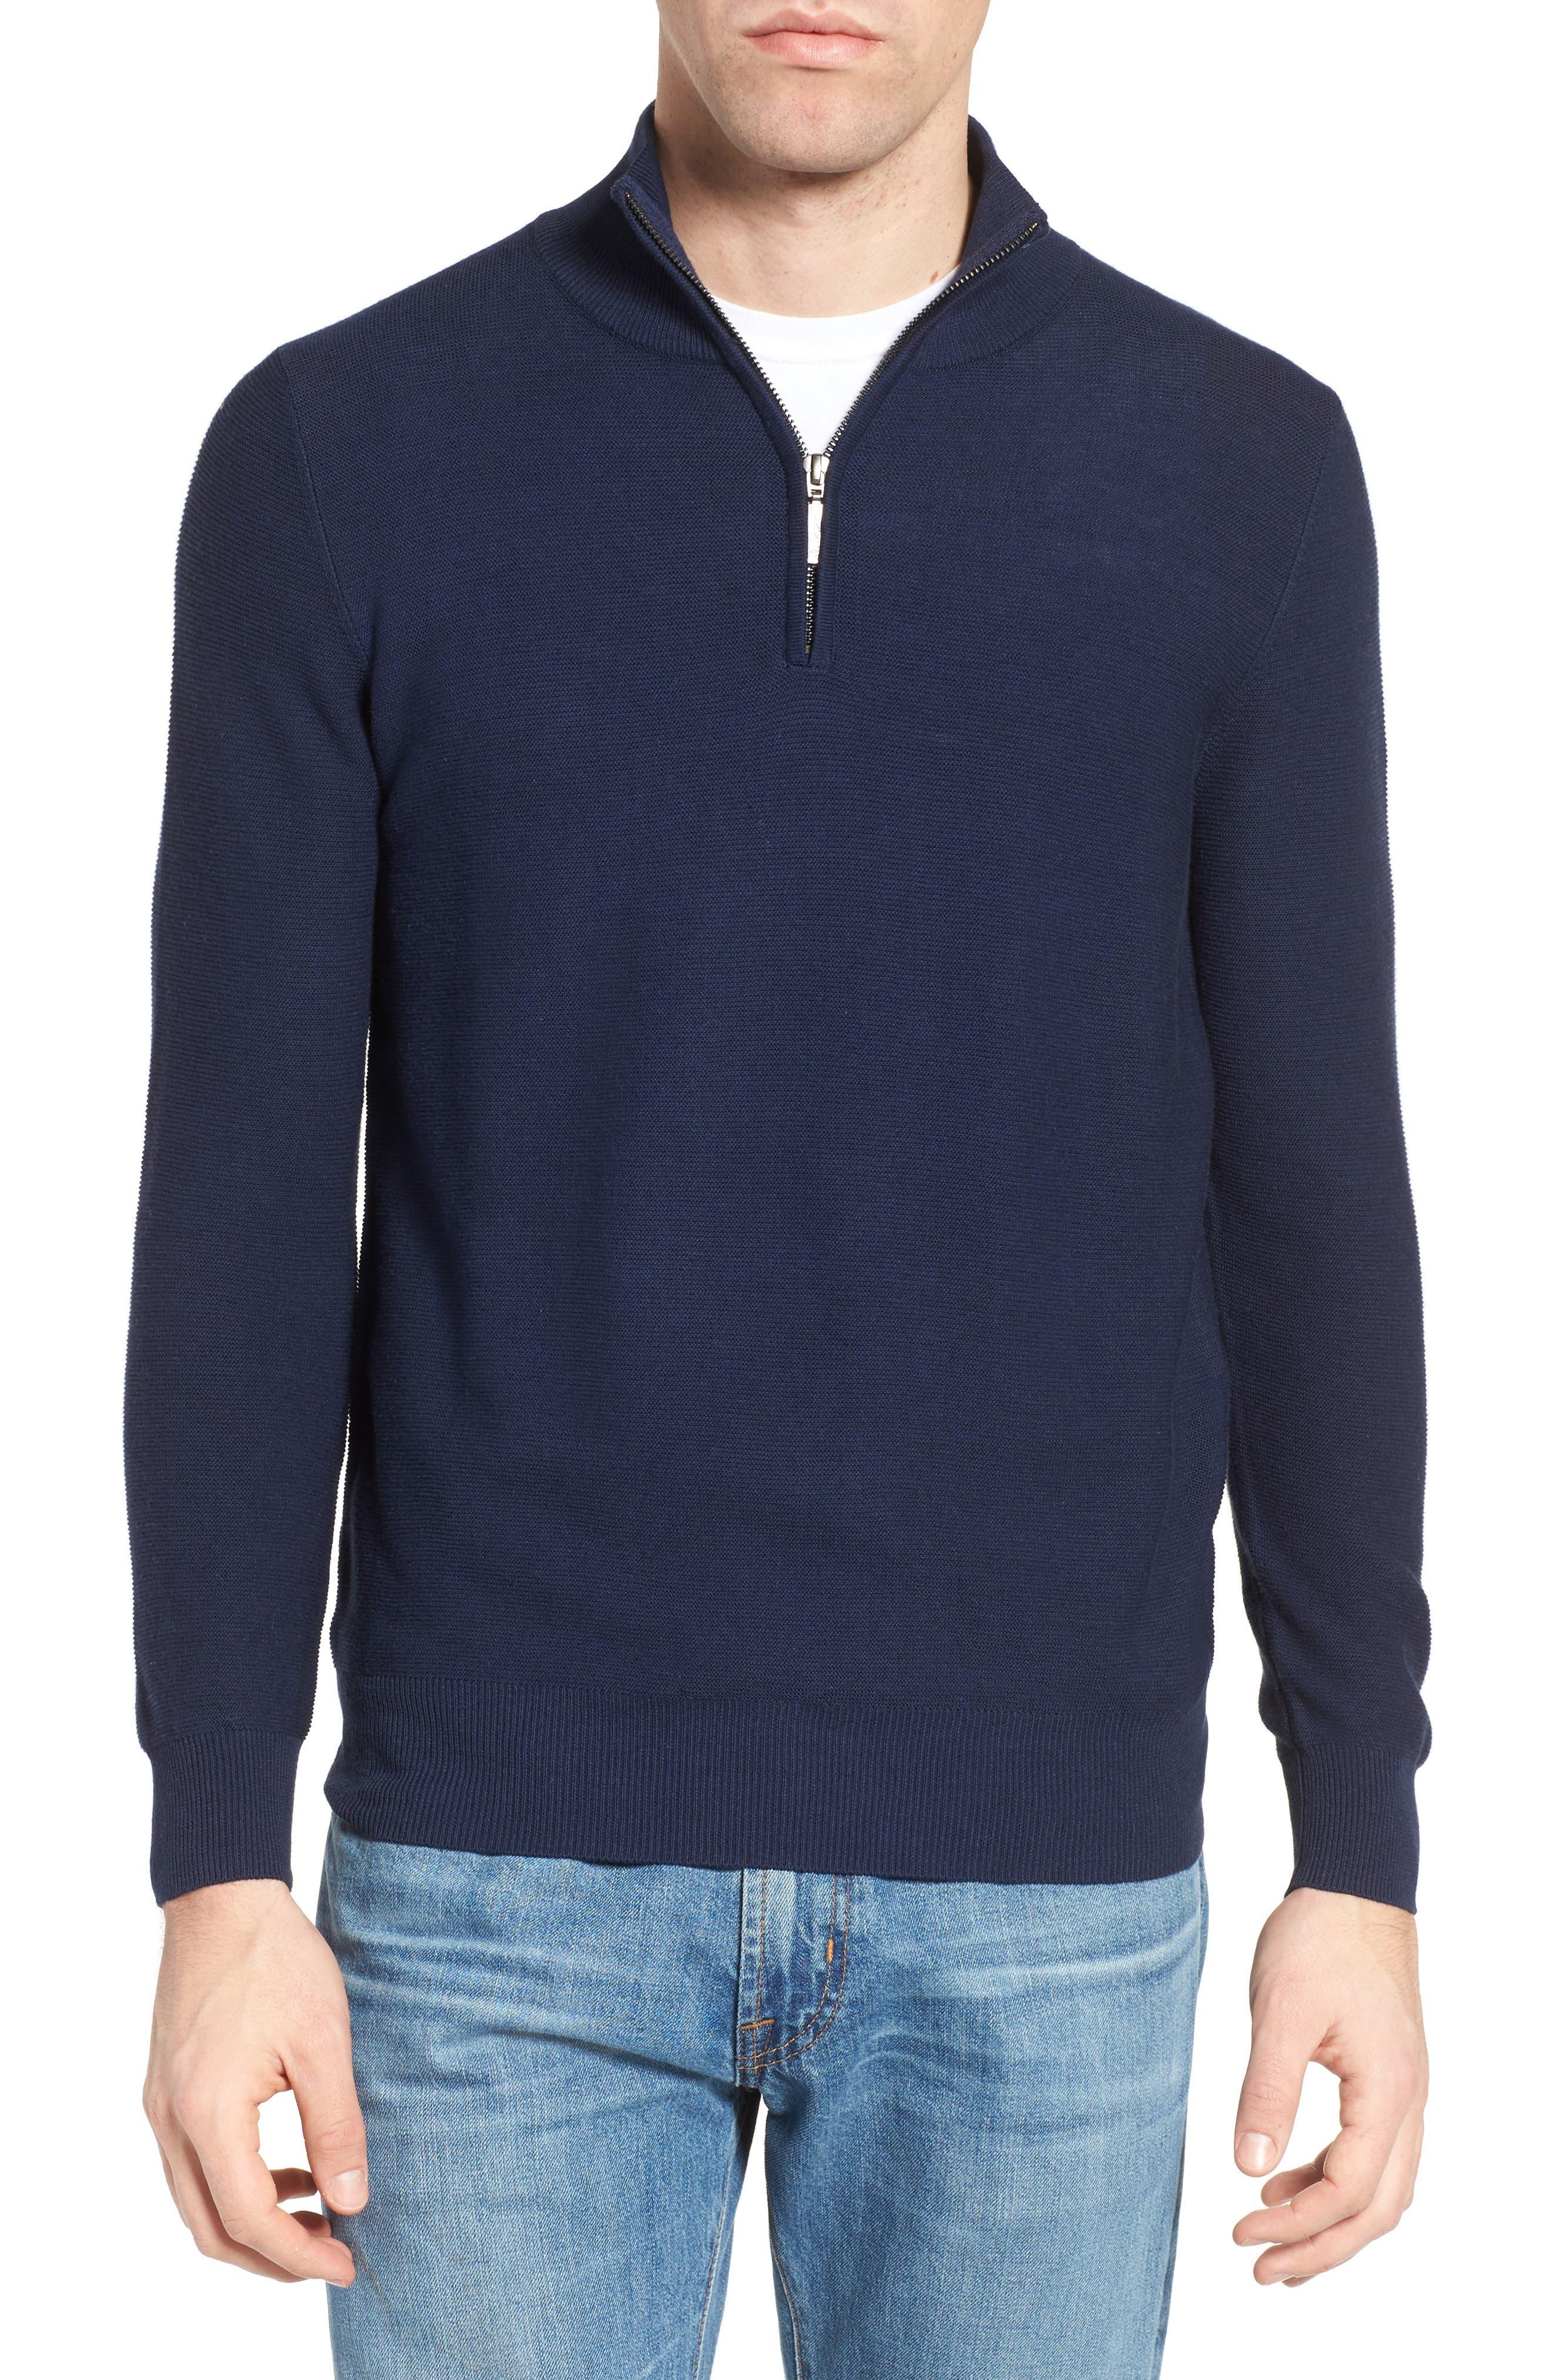 Jeremy Argyle Quarter Zip Sweater